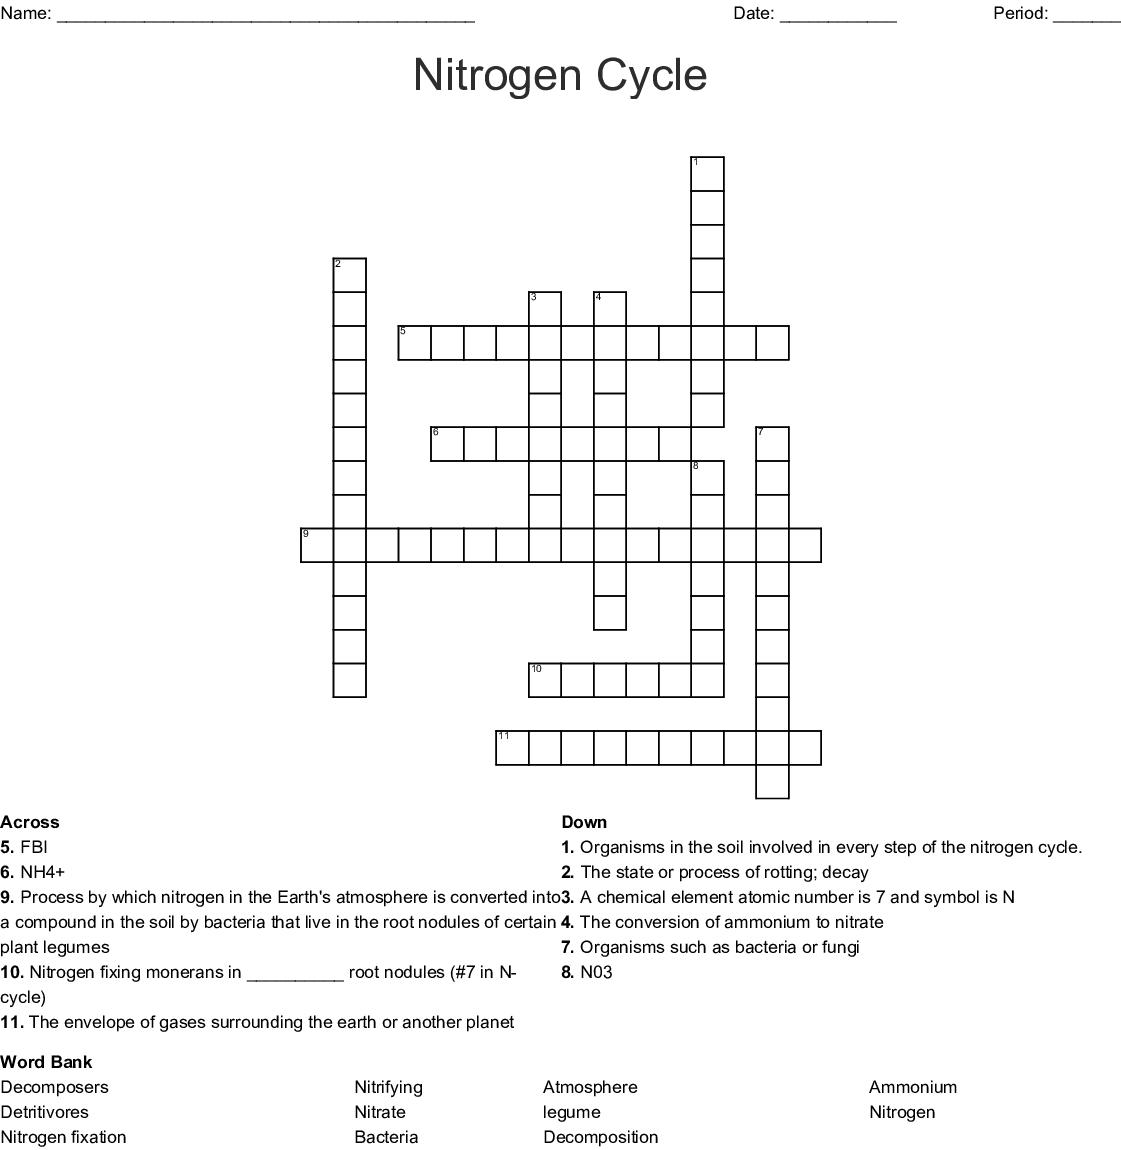 The Nitrogen Cycle Crossword